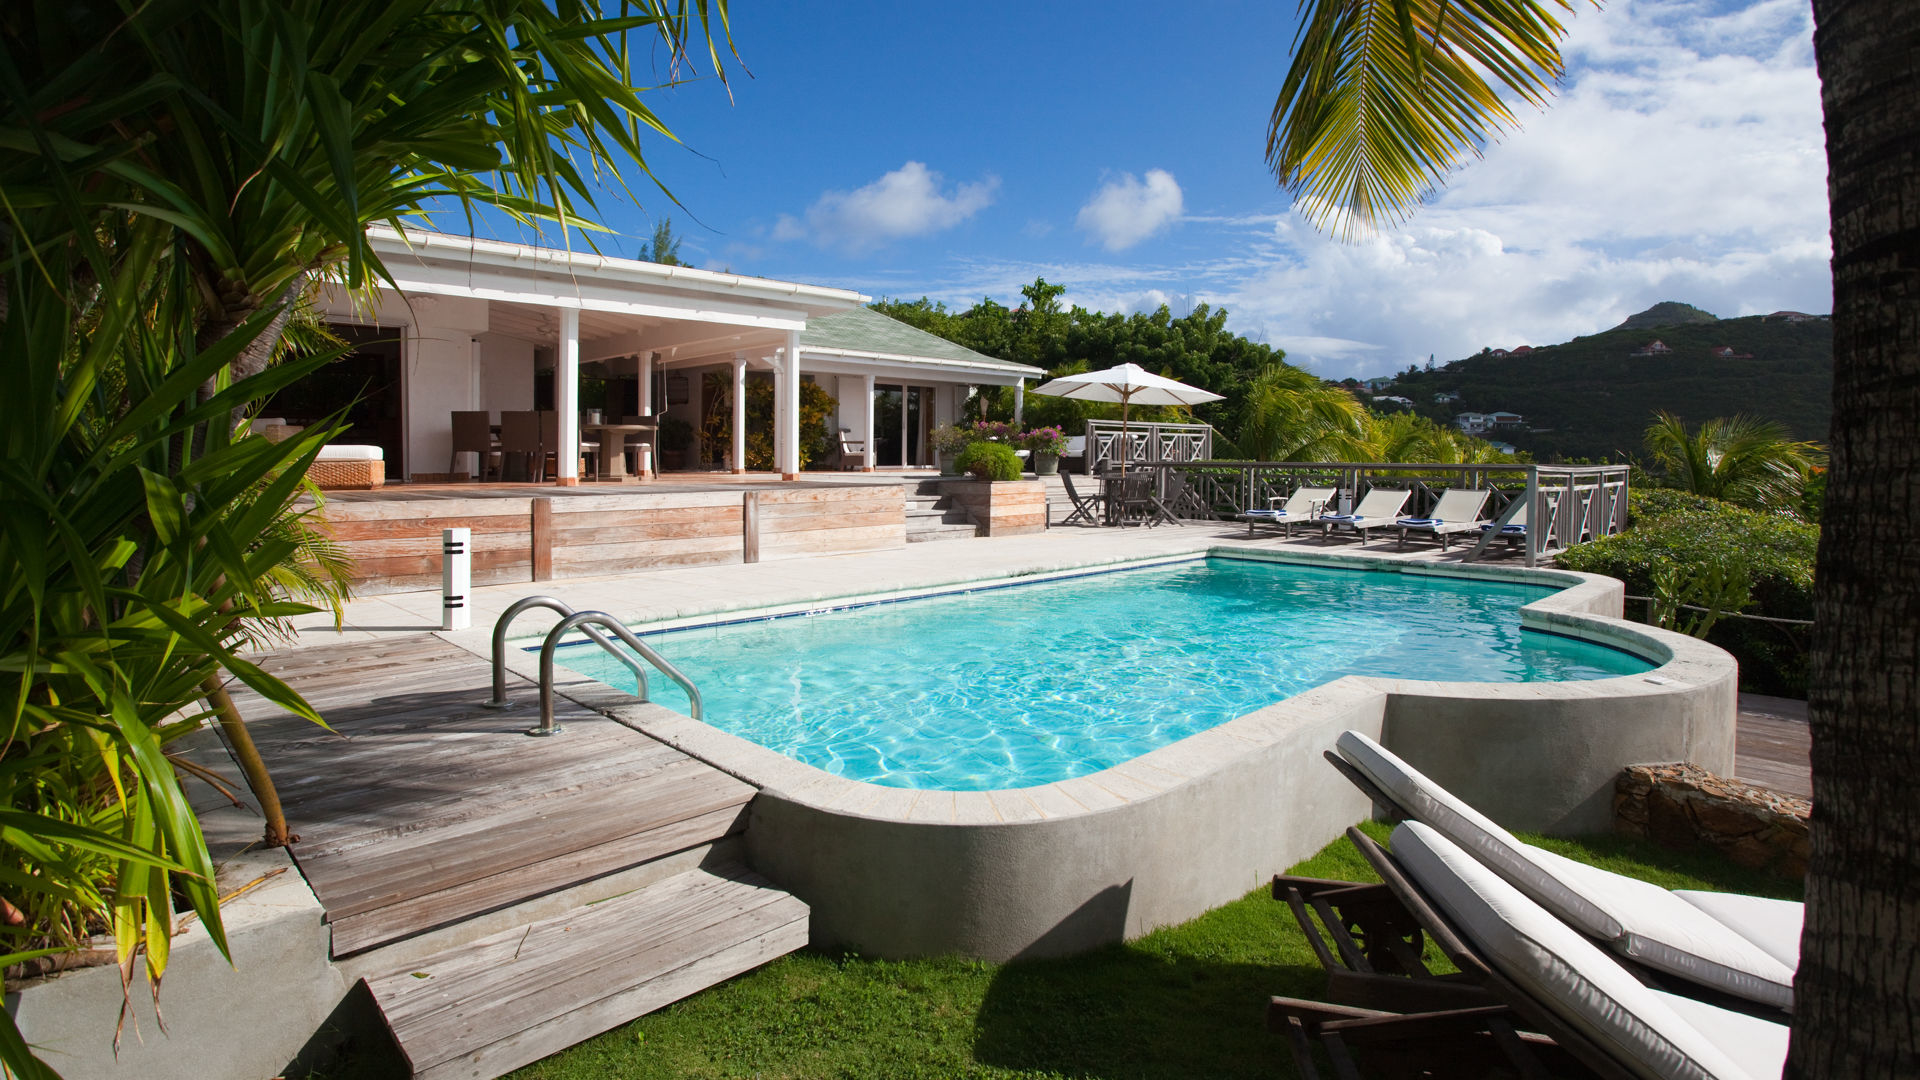 Luxury villa rentals caribbean - St barthelemy - Pointe milou - No location 4 - Cocoland - Image 1/22